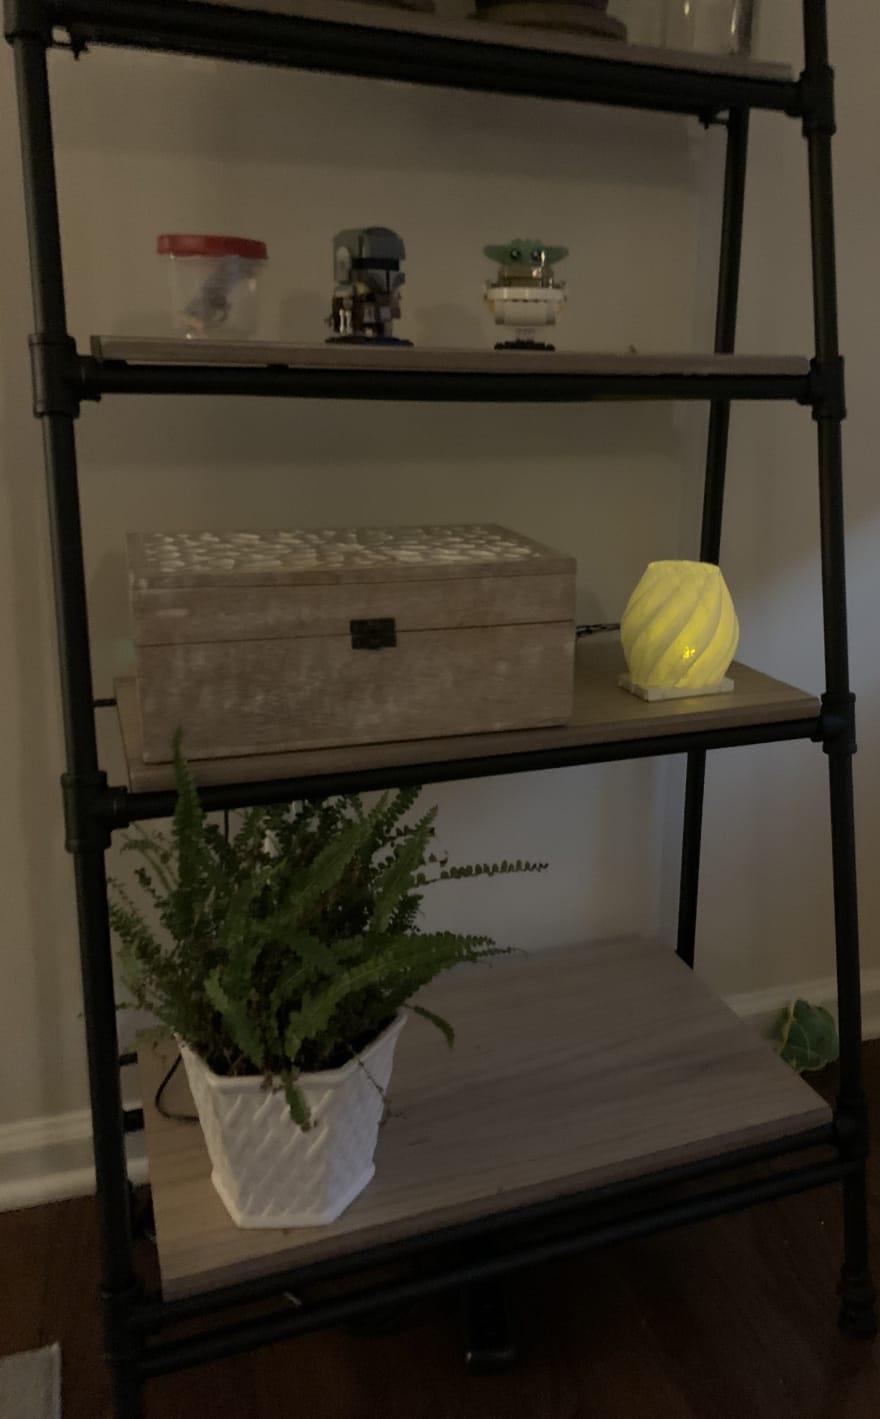 Weather Lamp and Raspberry Pi on shelf